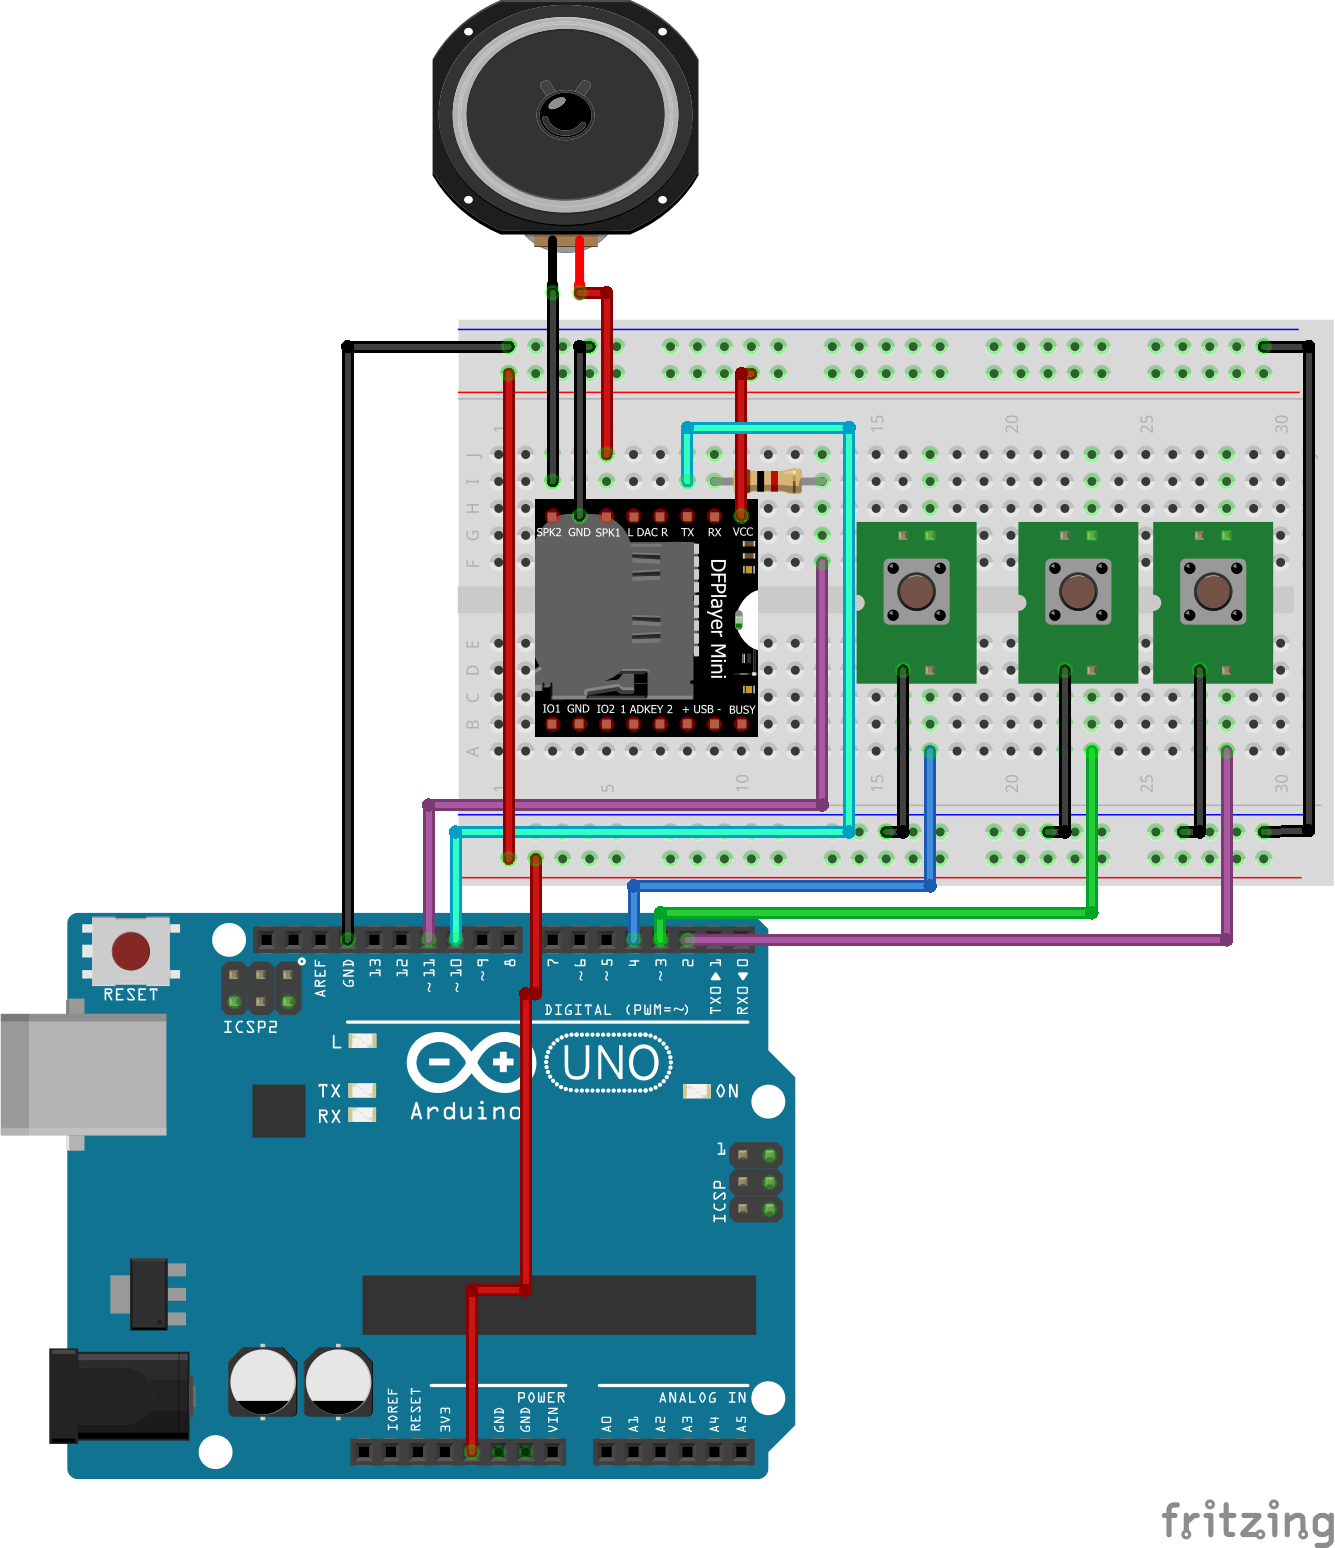 Arduino Mp3 Player Project Circuit Board Pcb With Fm Radio View Schematics